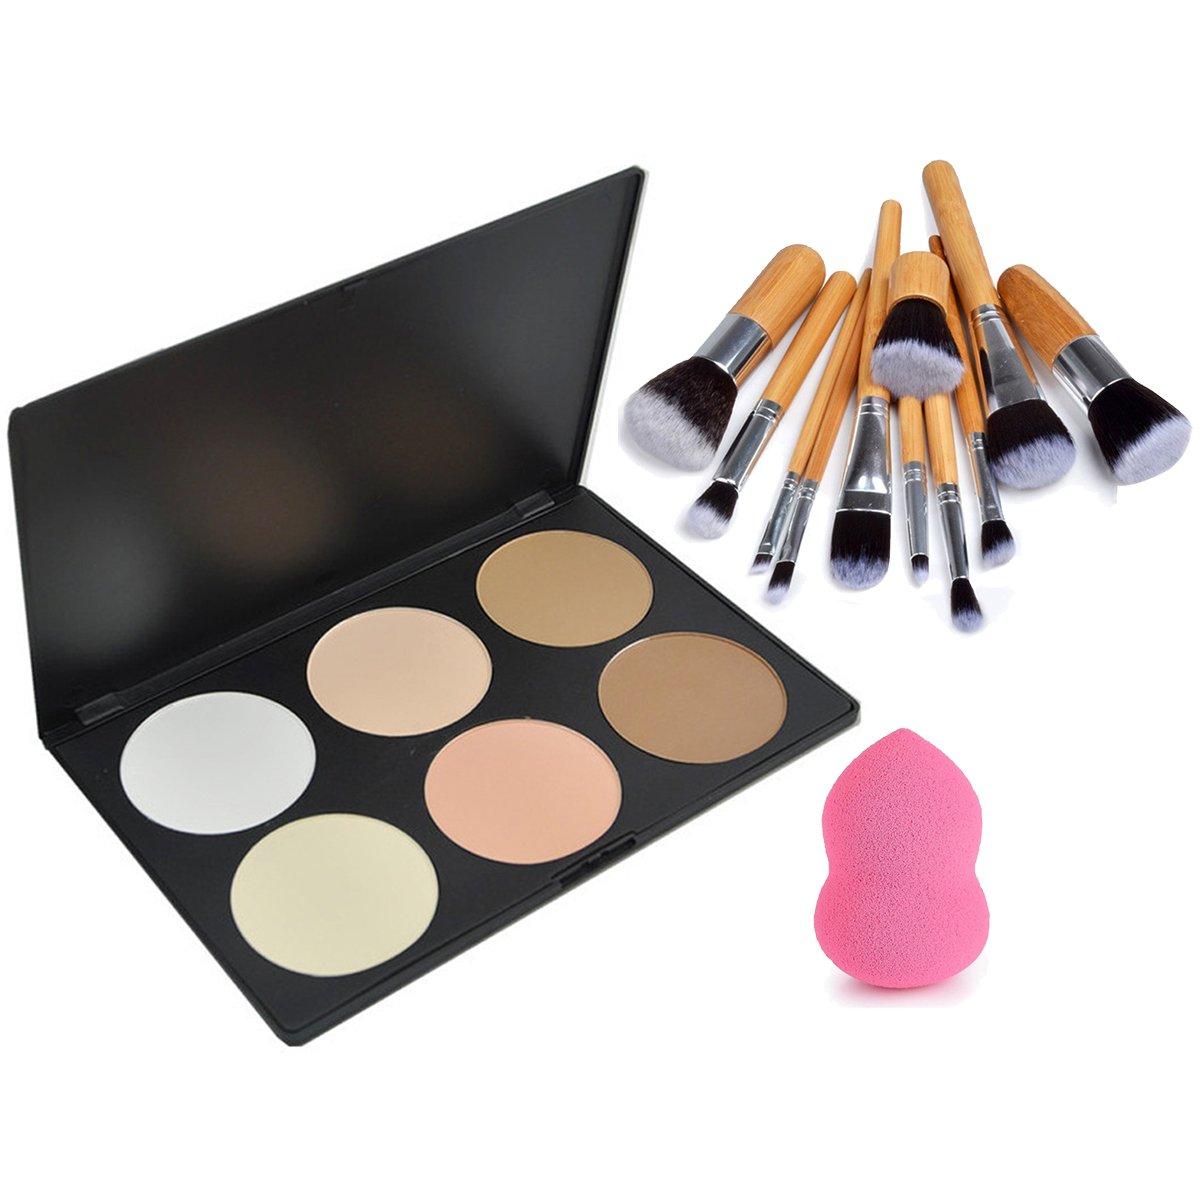 Vonisa 6colore Contour cipria kit-base fondotinta correttore palette-sleek pigmento Pro correttore palette-cosmetics contouring highlighting Bronzing con 11PCS make up pennelli set-makeup spugna